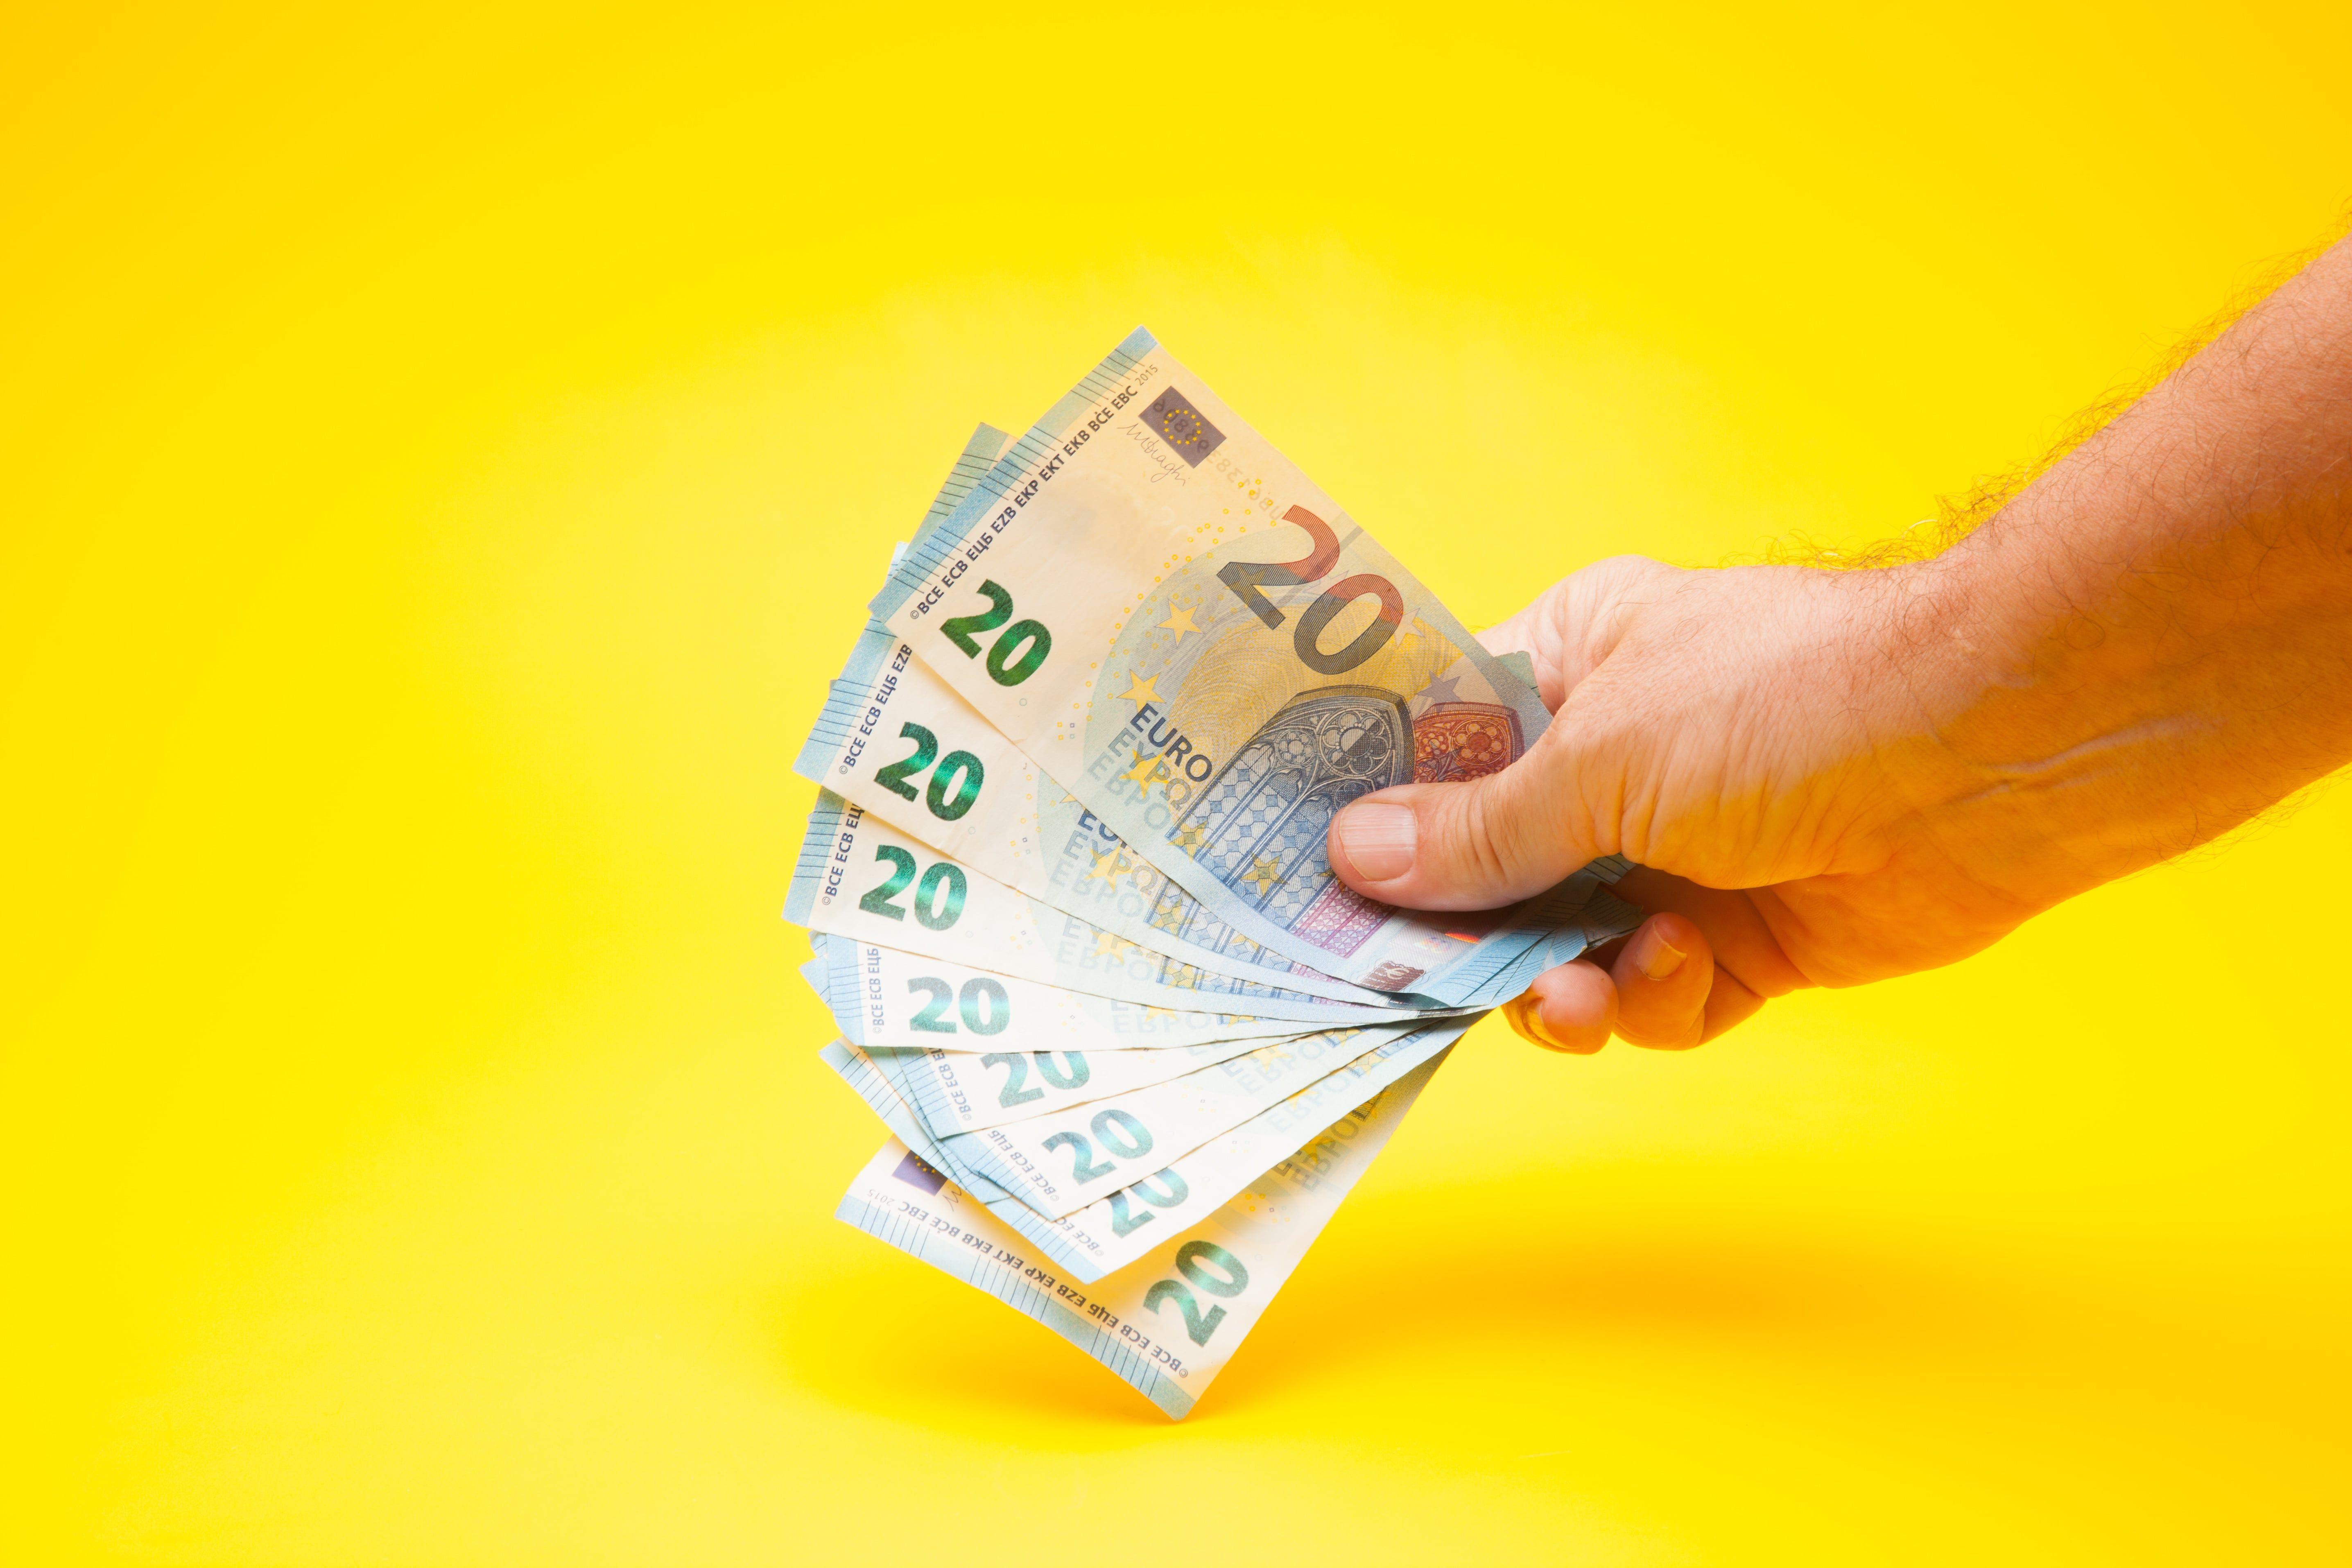 Como declarar rendimentos do exterior no Imposto de Renda?